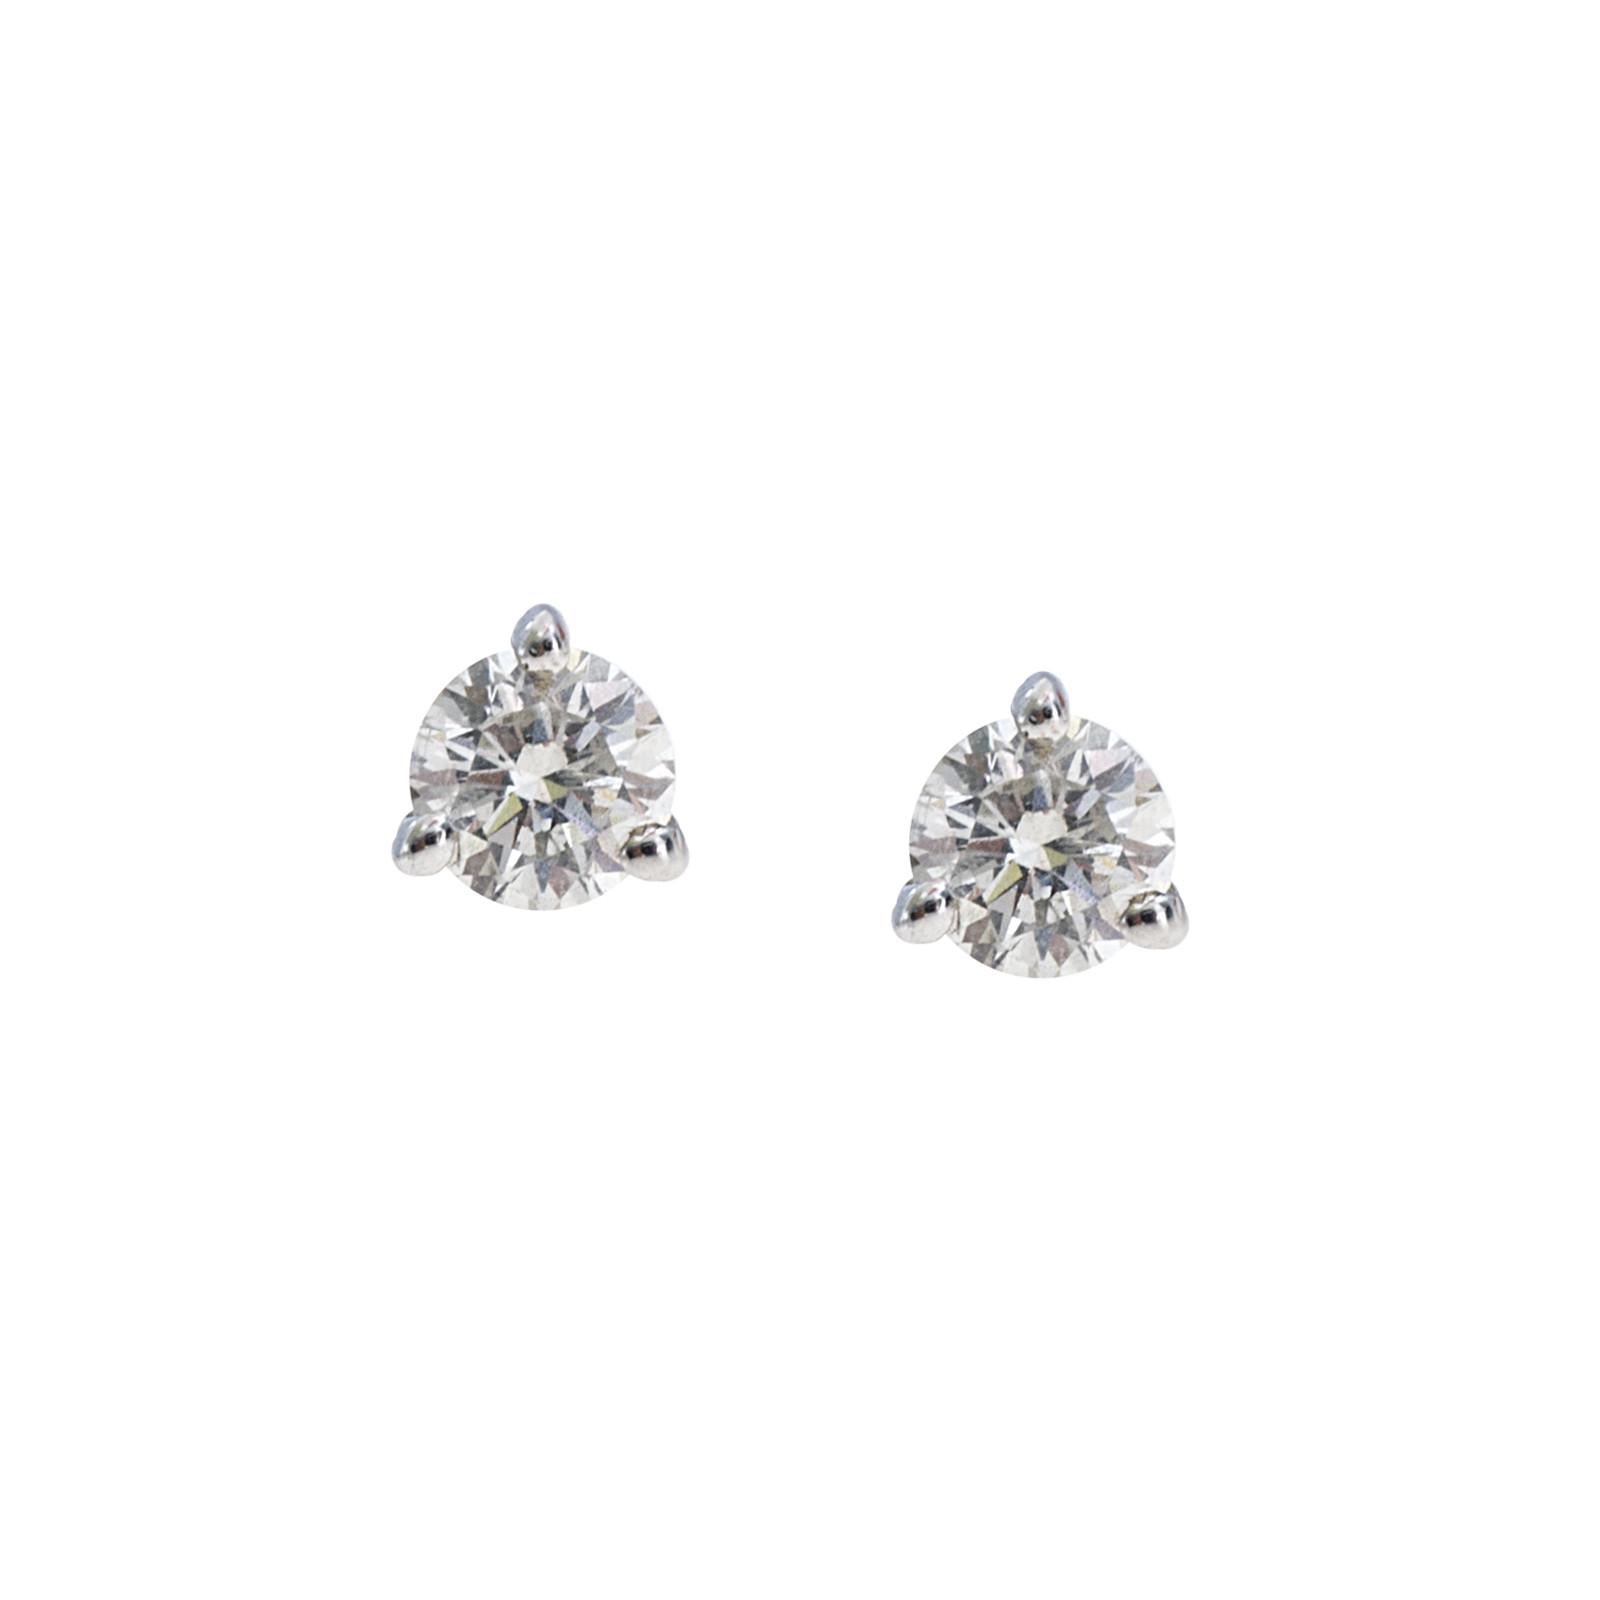 New 0.25 CTW Diamond Stud Earrings